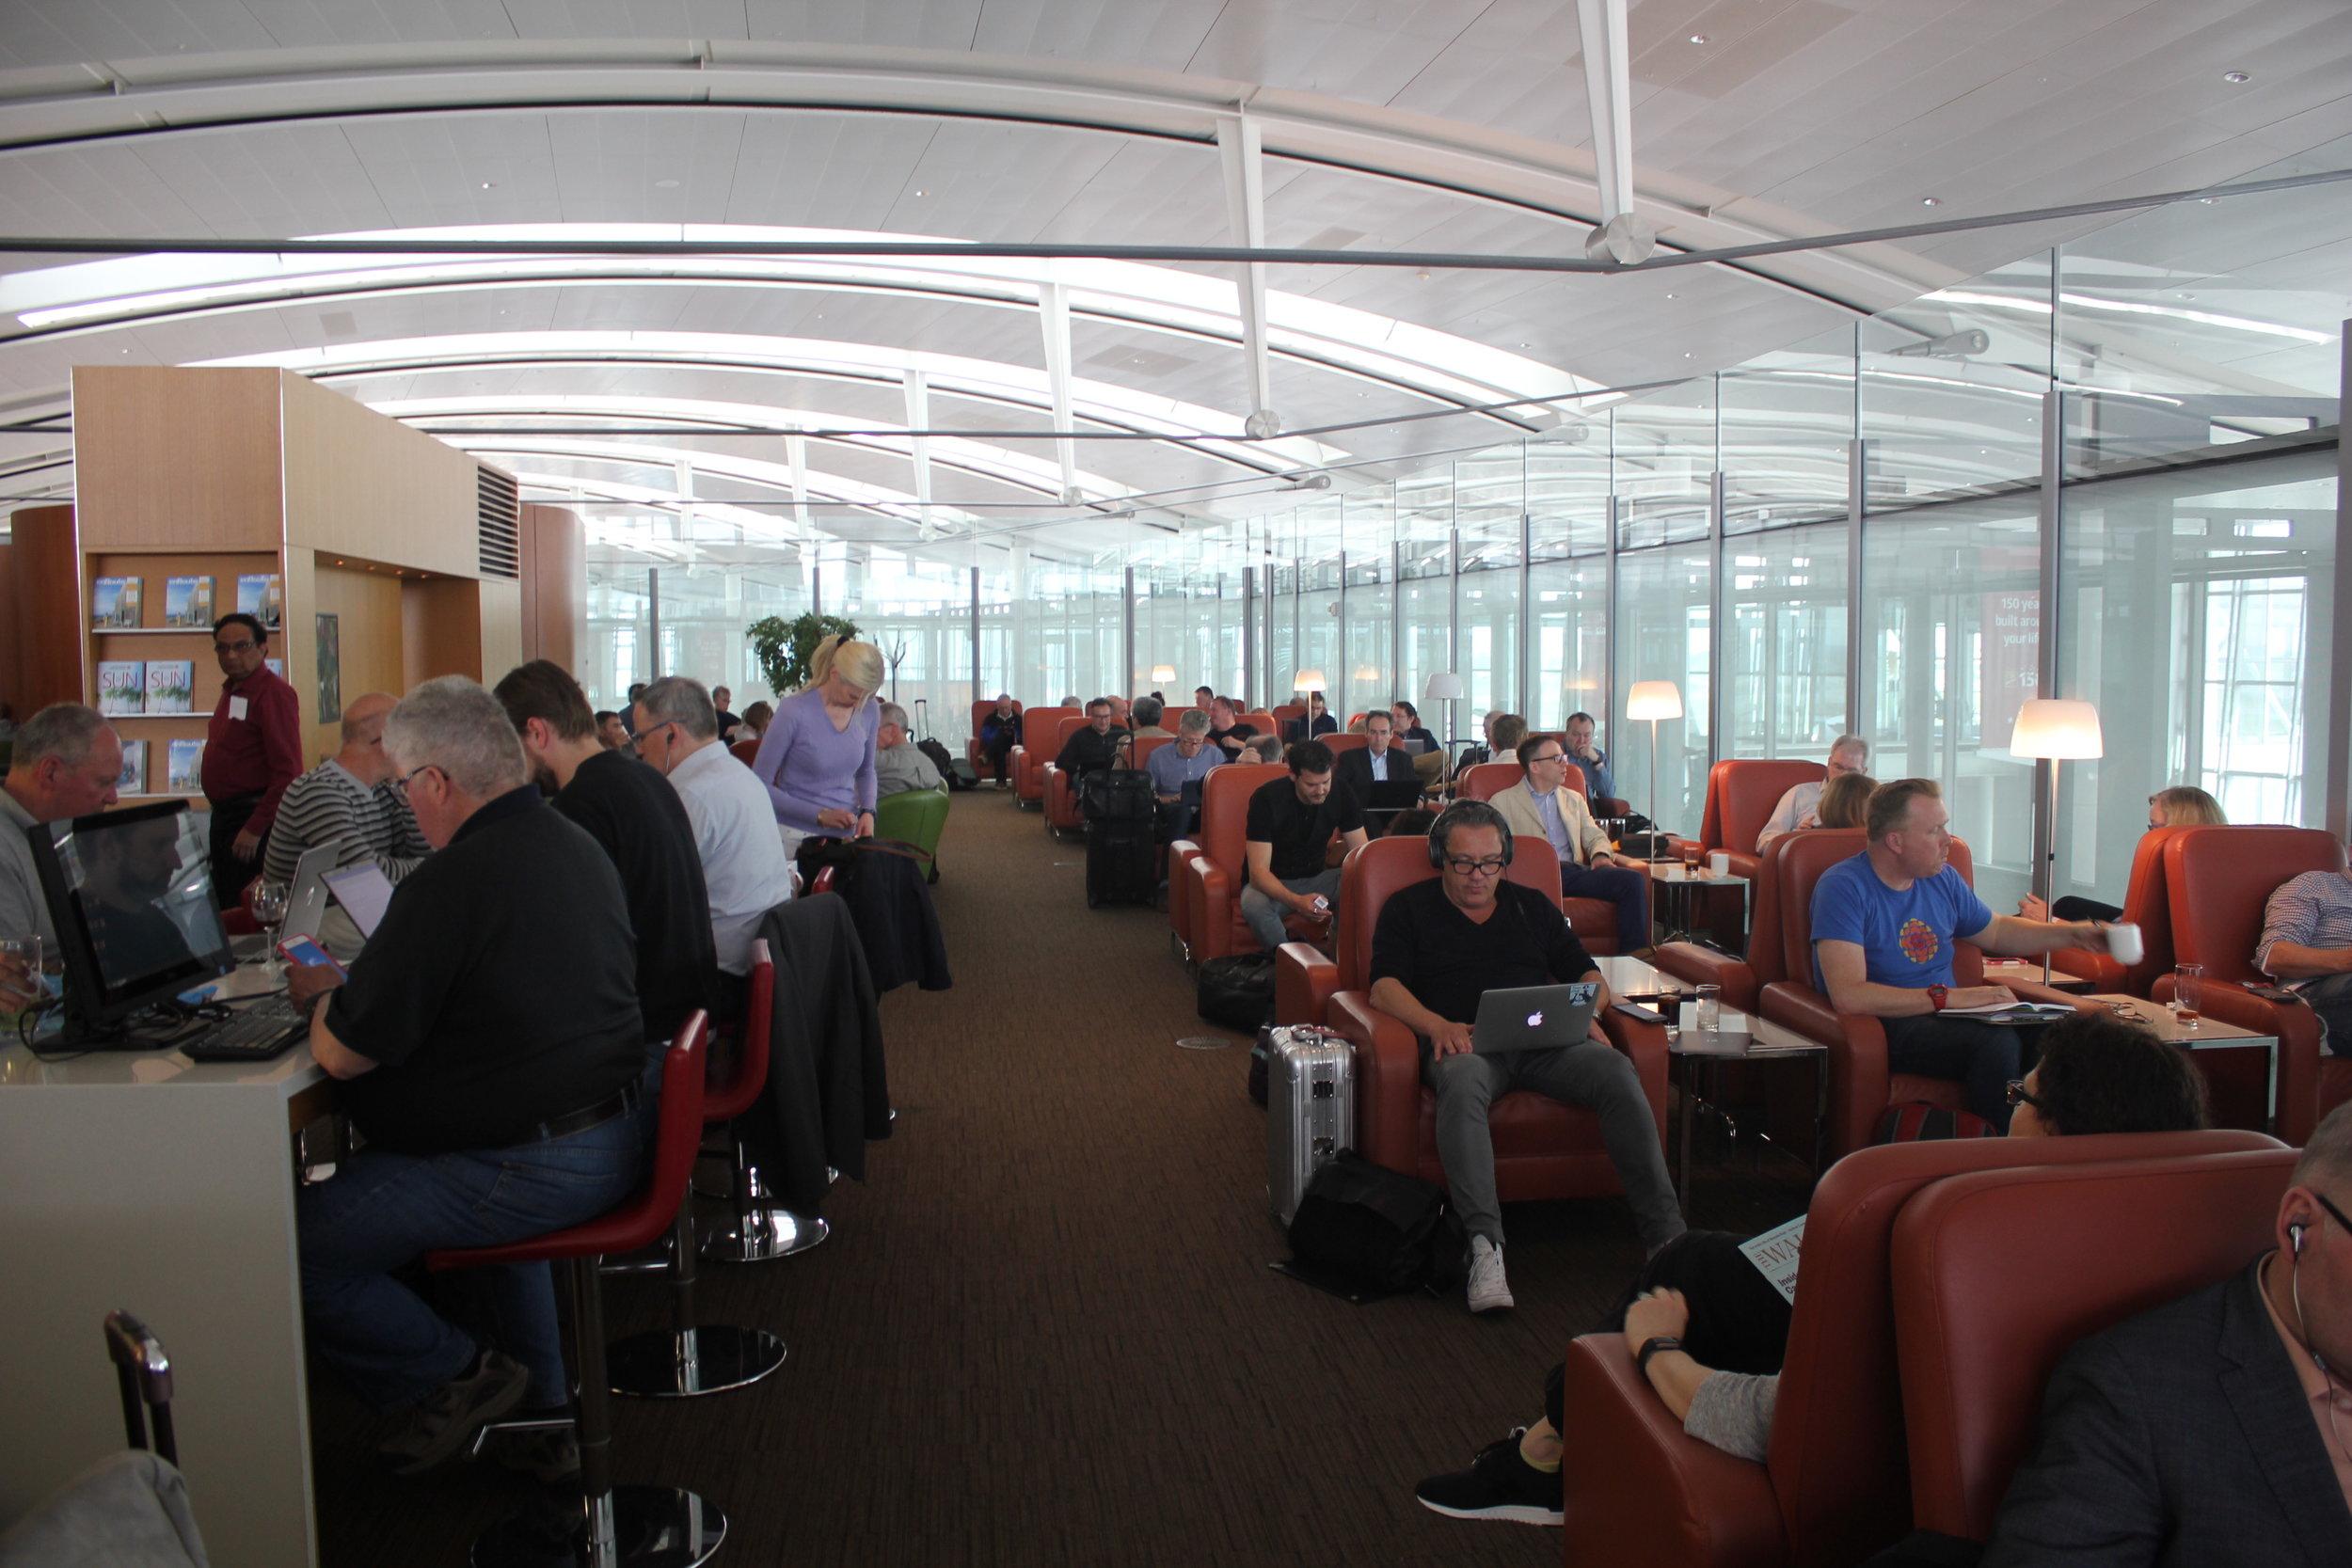 Air Canada Maple Leaf Lounge Toronto (International) – Seating area